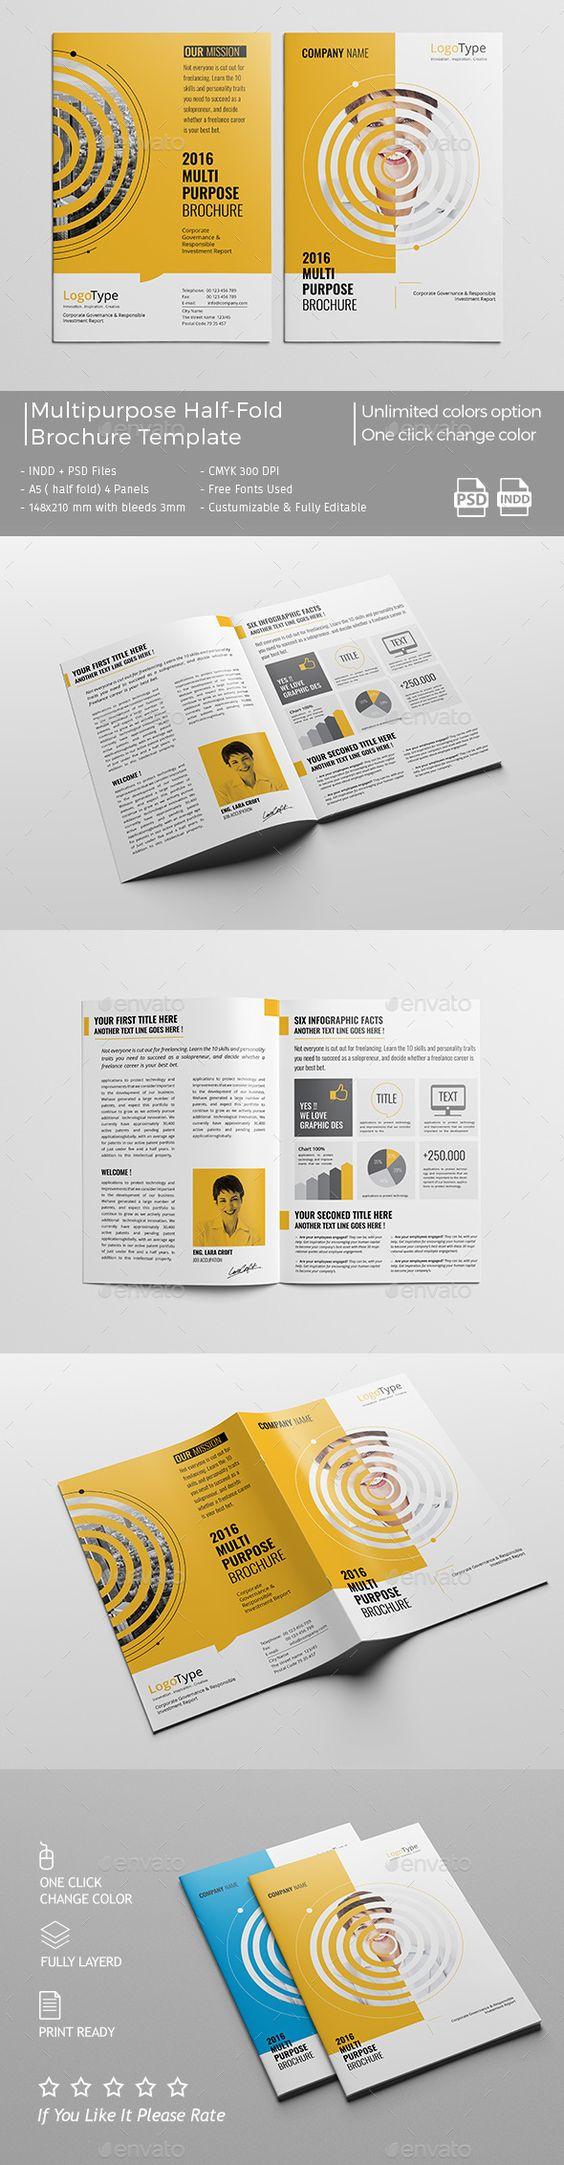 Pro Multipurpose Half-Fold Brochure Template #design Download: http://graphicriver.net/item/pro-multipurpose-halffold-brochure/13122579?ref=ksioks